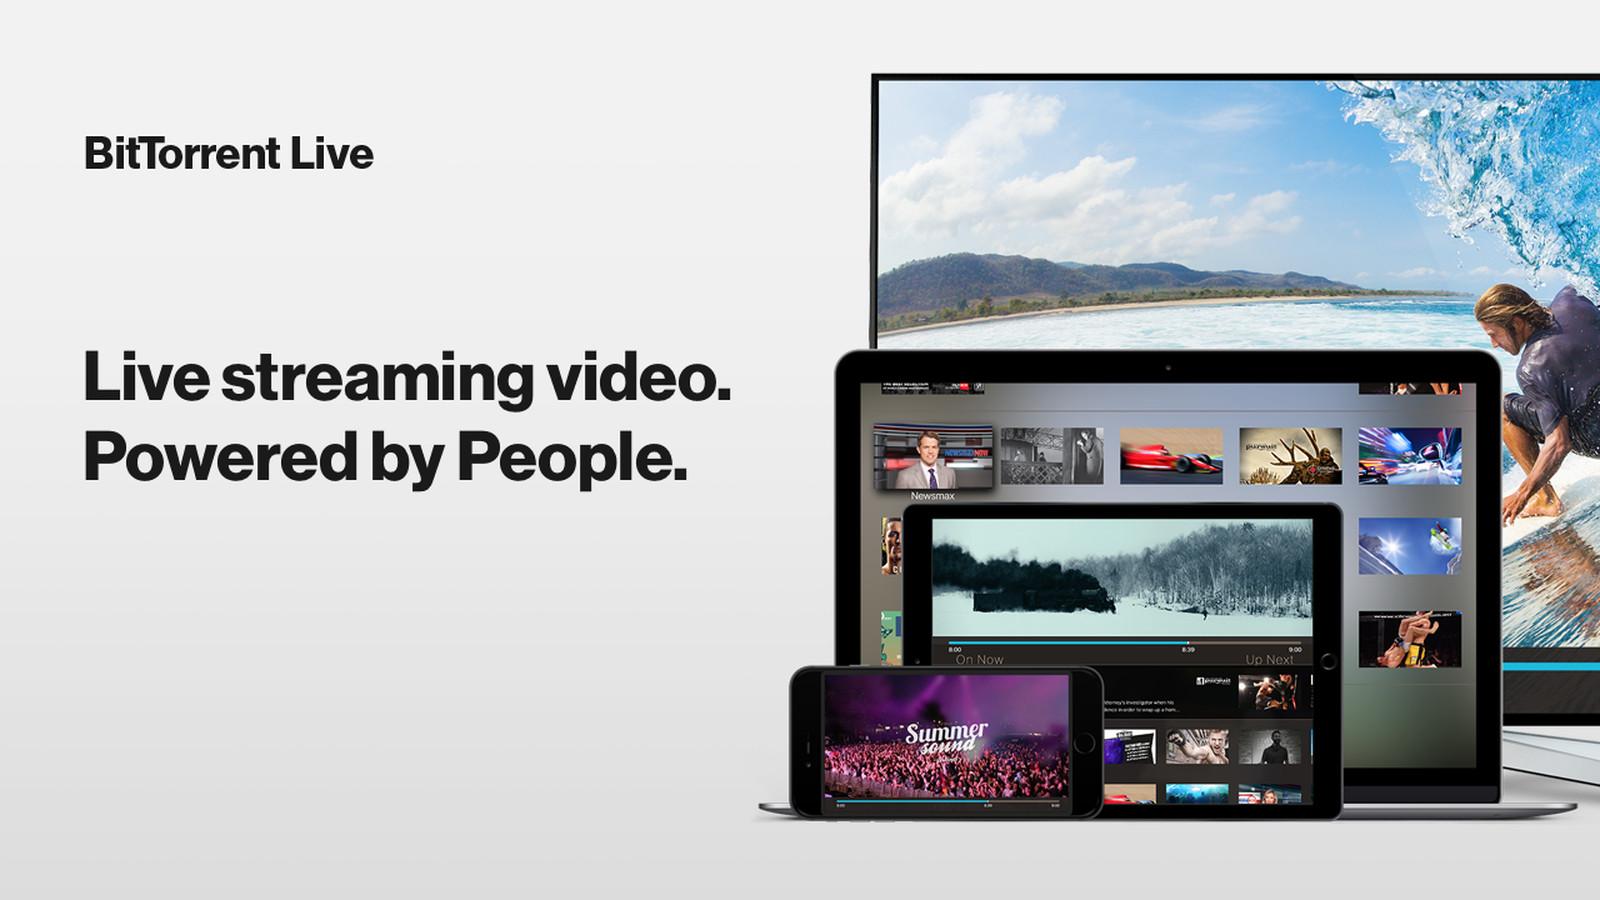 BitTorrent将在第二季度上线分散式视频社交媒体BitTorrent Live